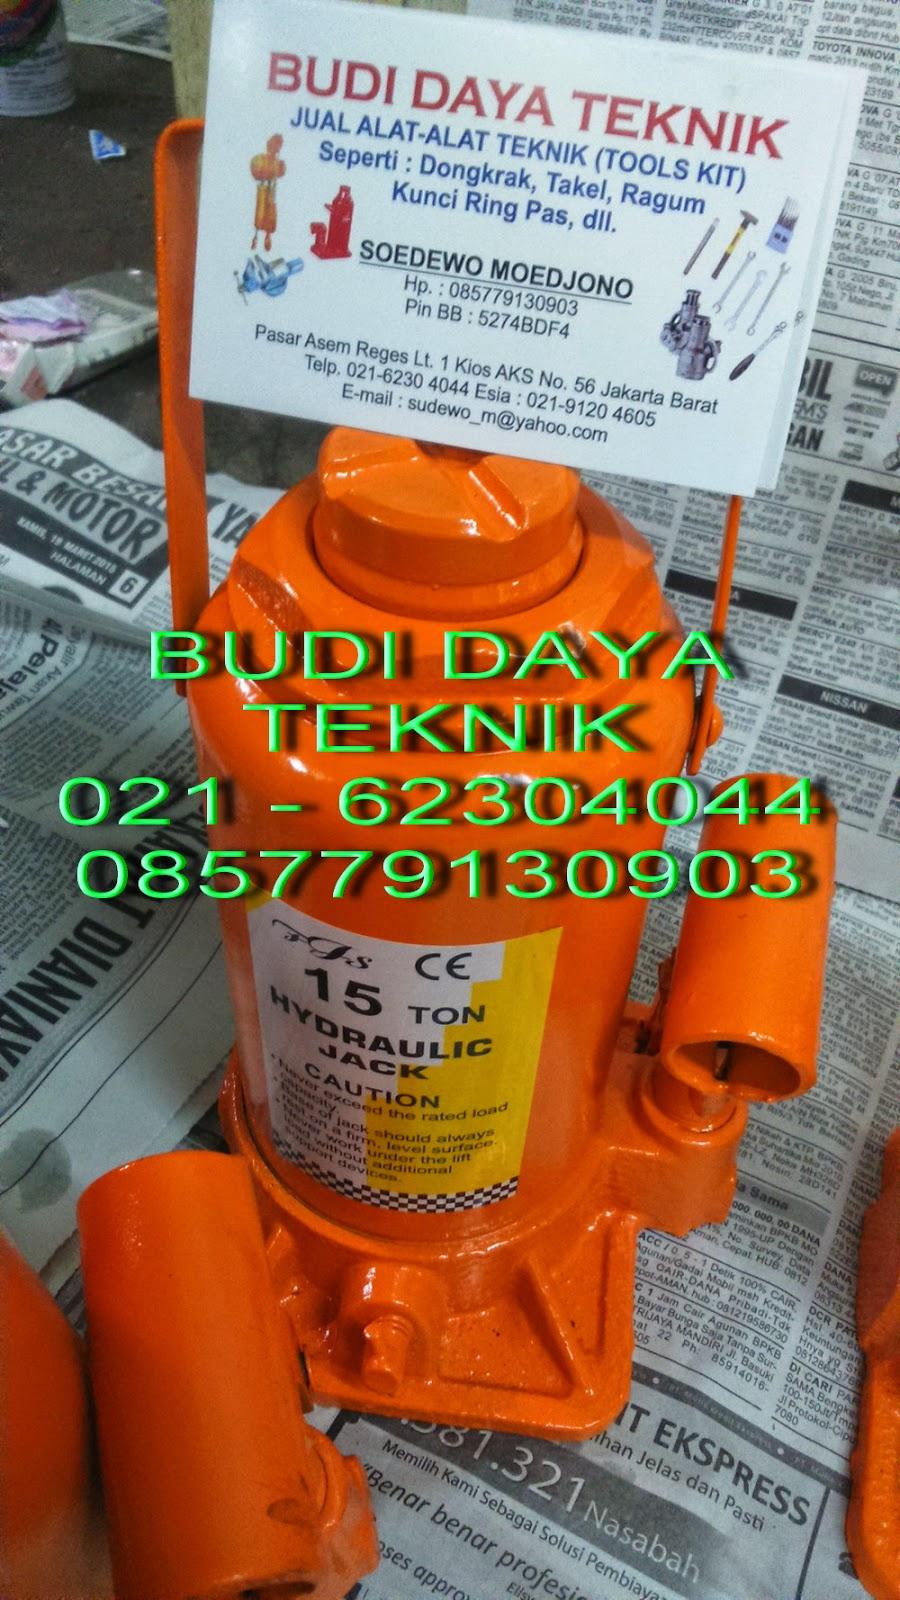 Jual Chain Block Takel Lever Budi Daya Teknik Tekiro Dongkrak Botol 20 Ton Kunci Ring Set 6 32mm Rp550000 2